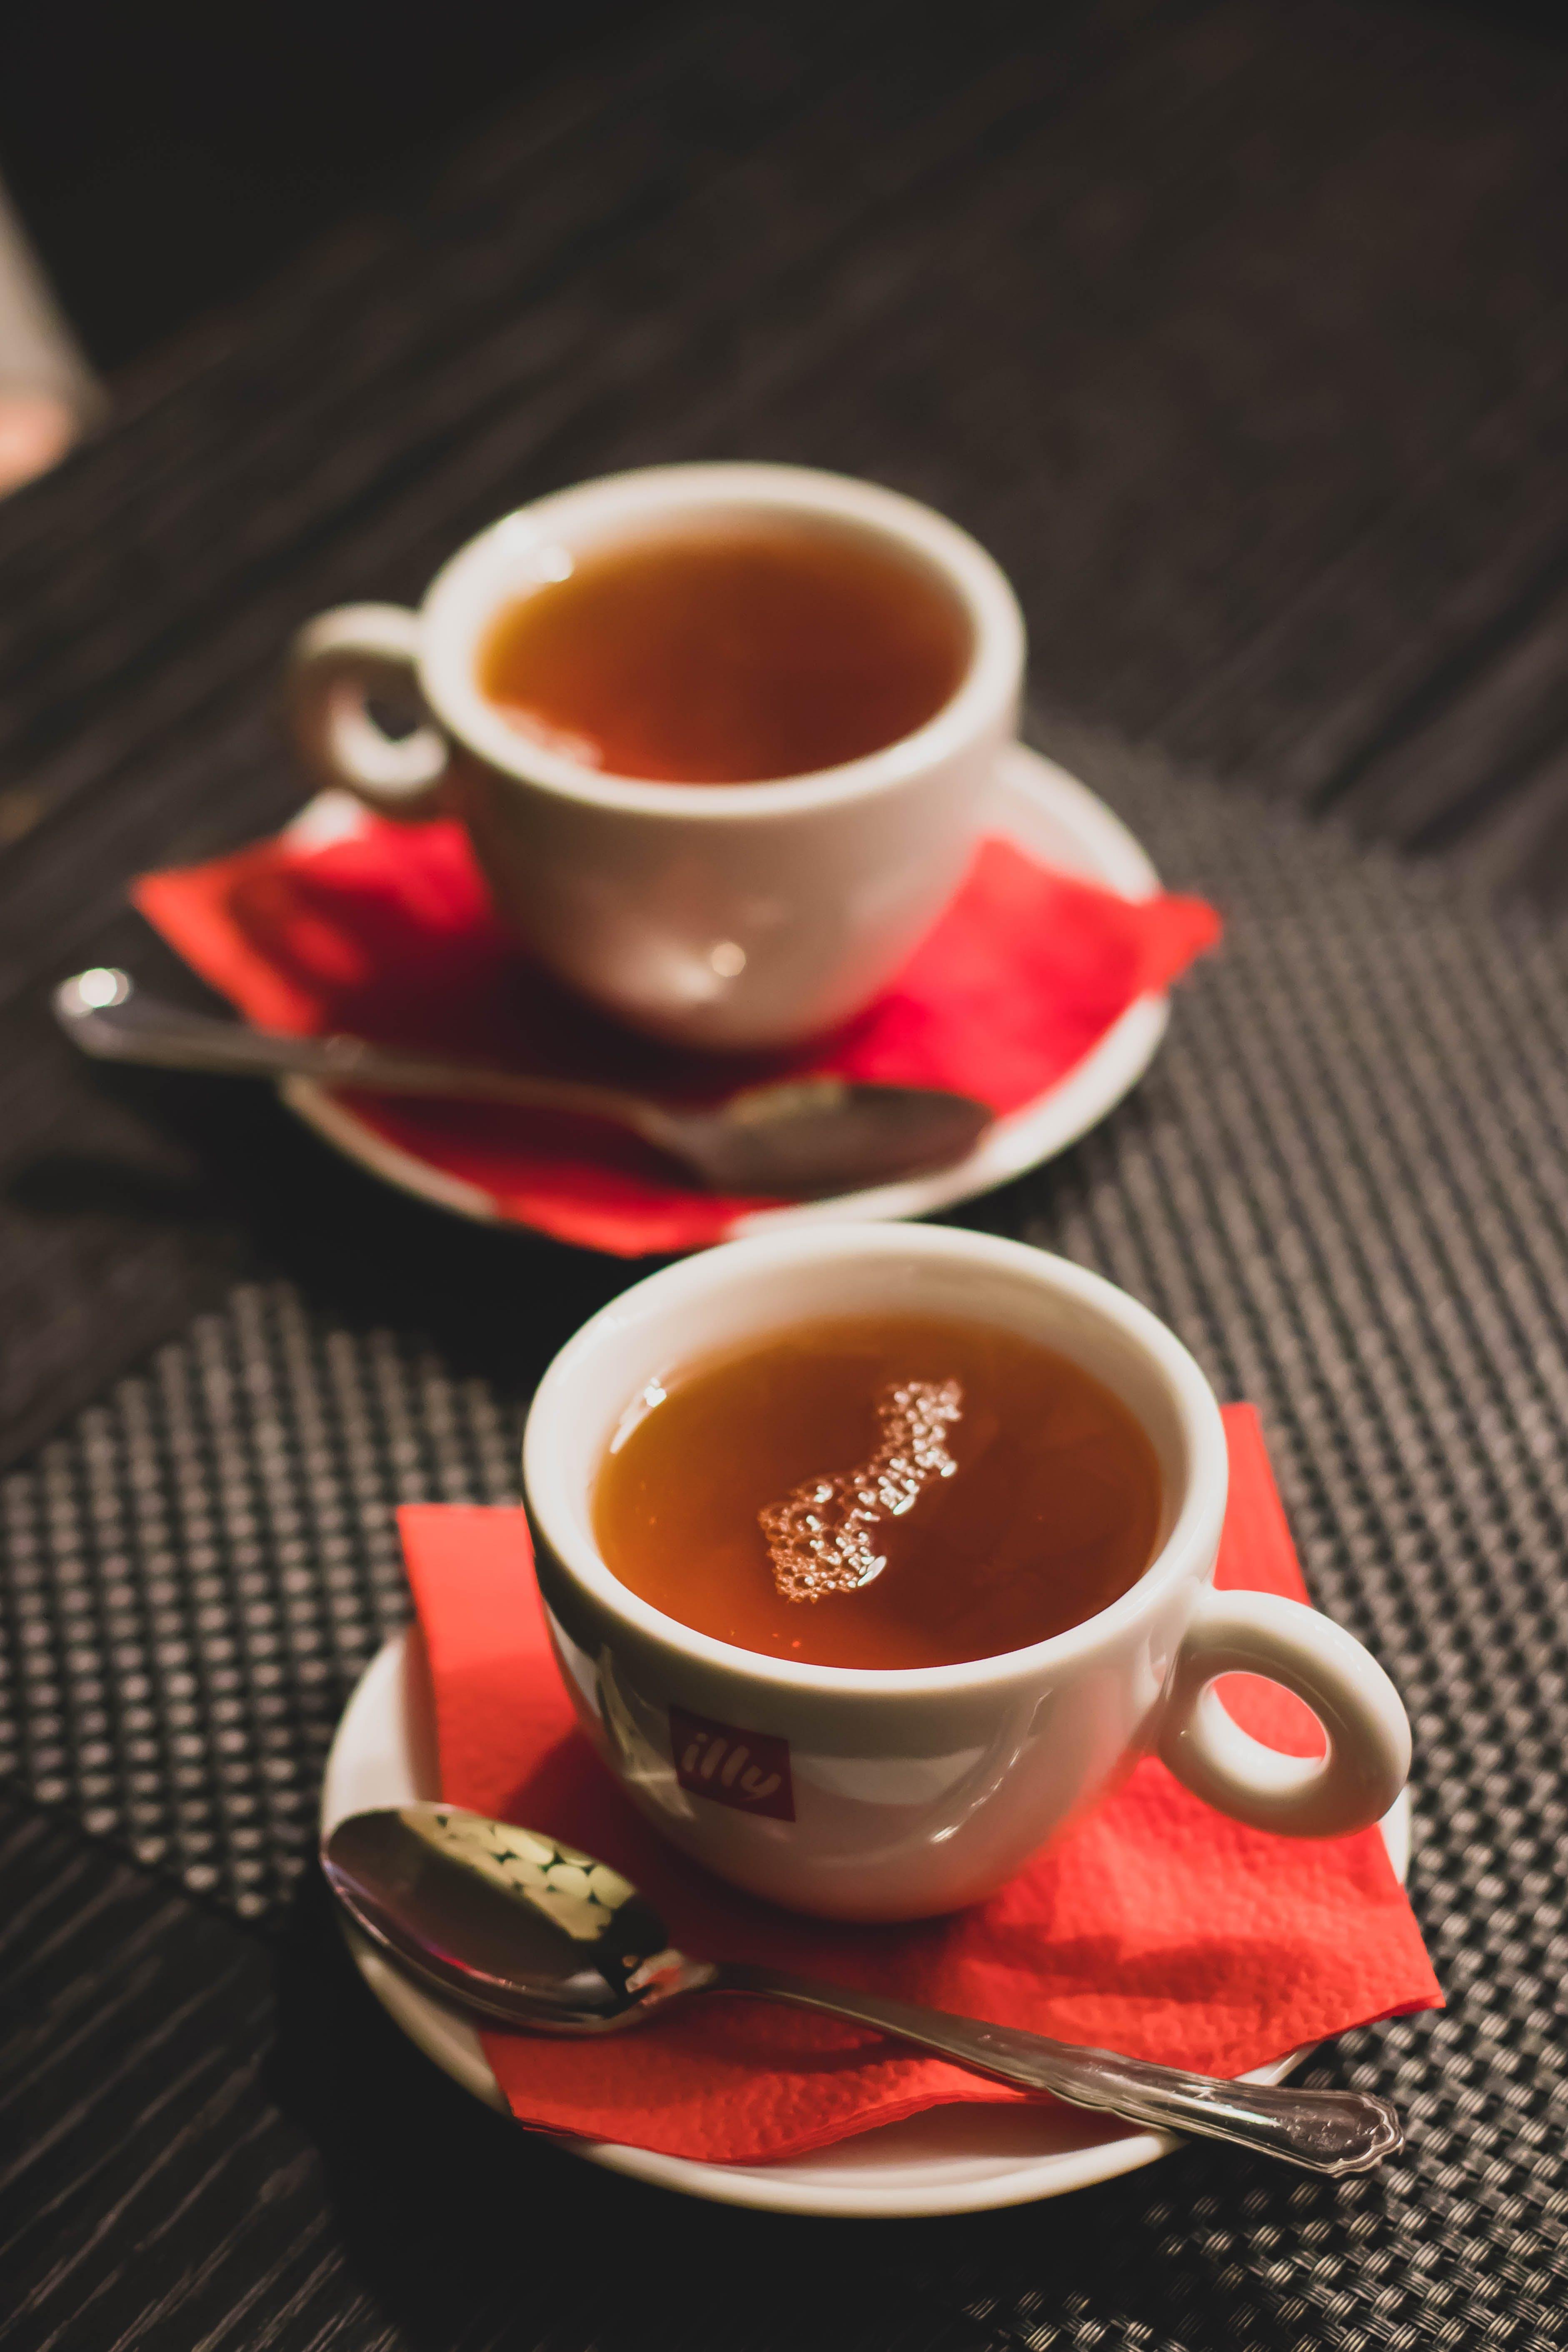 Cup Tea With Saucer and Teaspoon